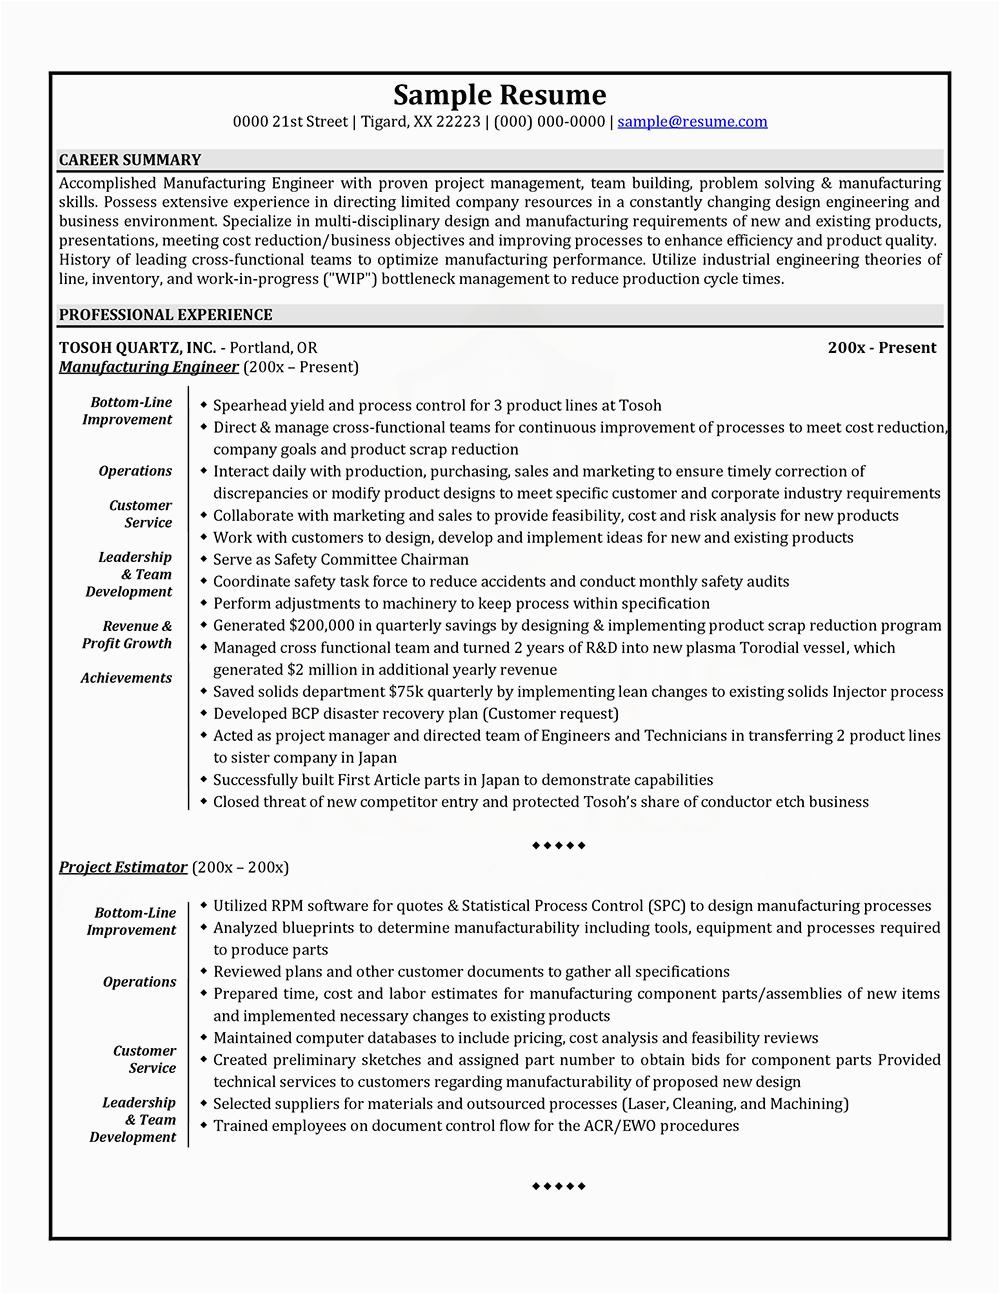 ivy league resume